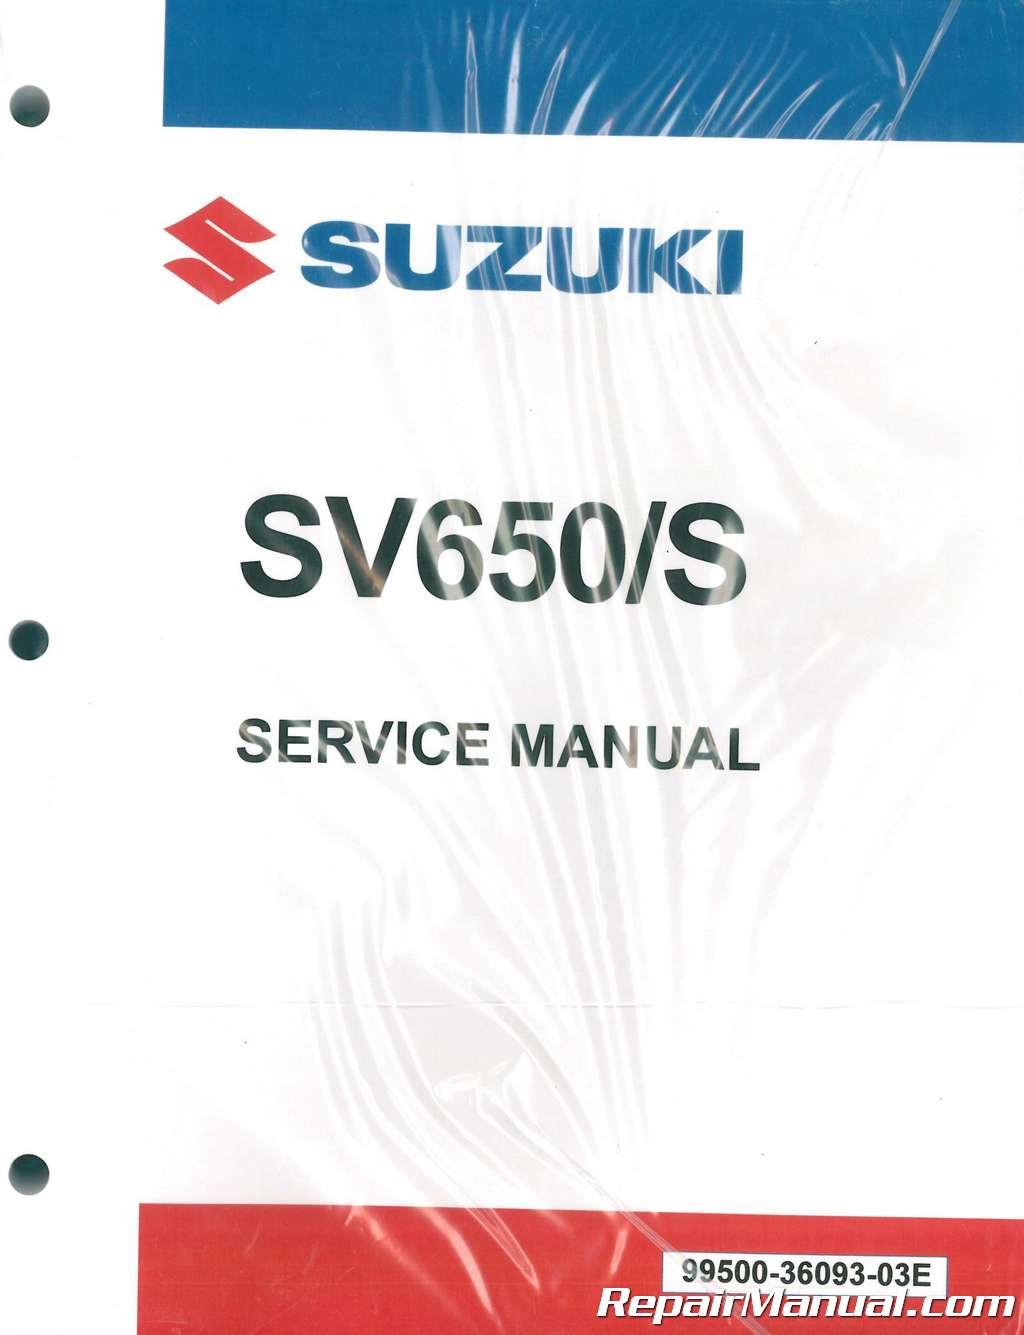 2005 sv650 maintenance